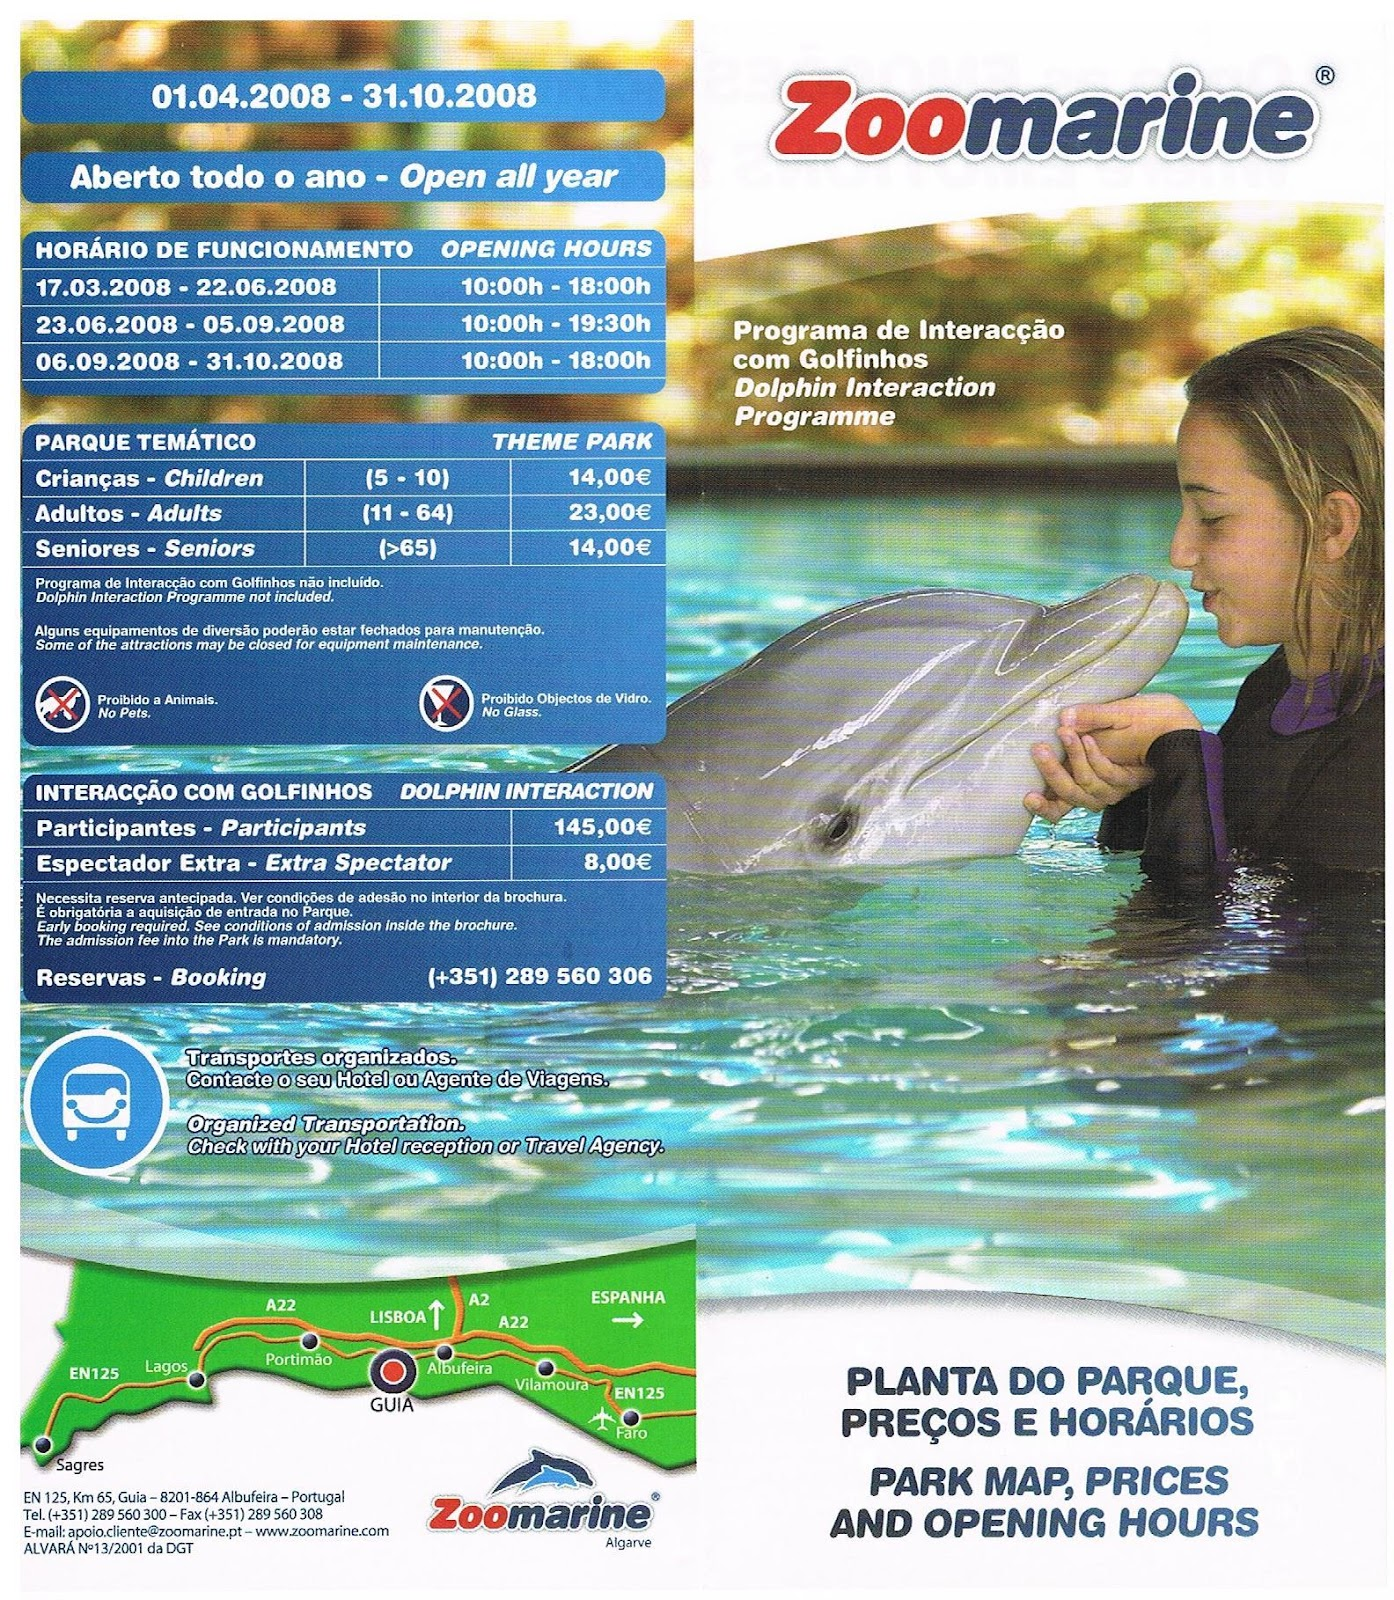 zoomarine mapa Vai e Vem: Zoomarine   Mapa zoomarine mapa